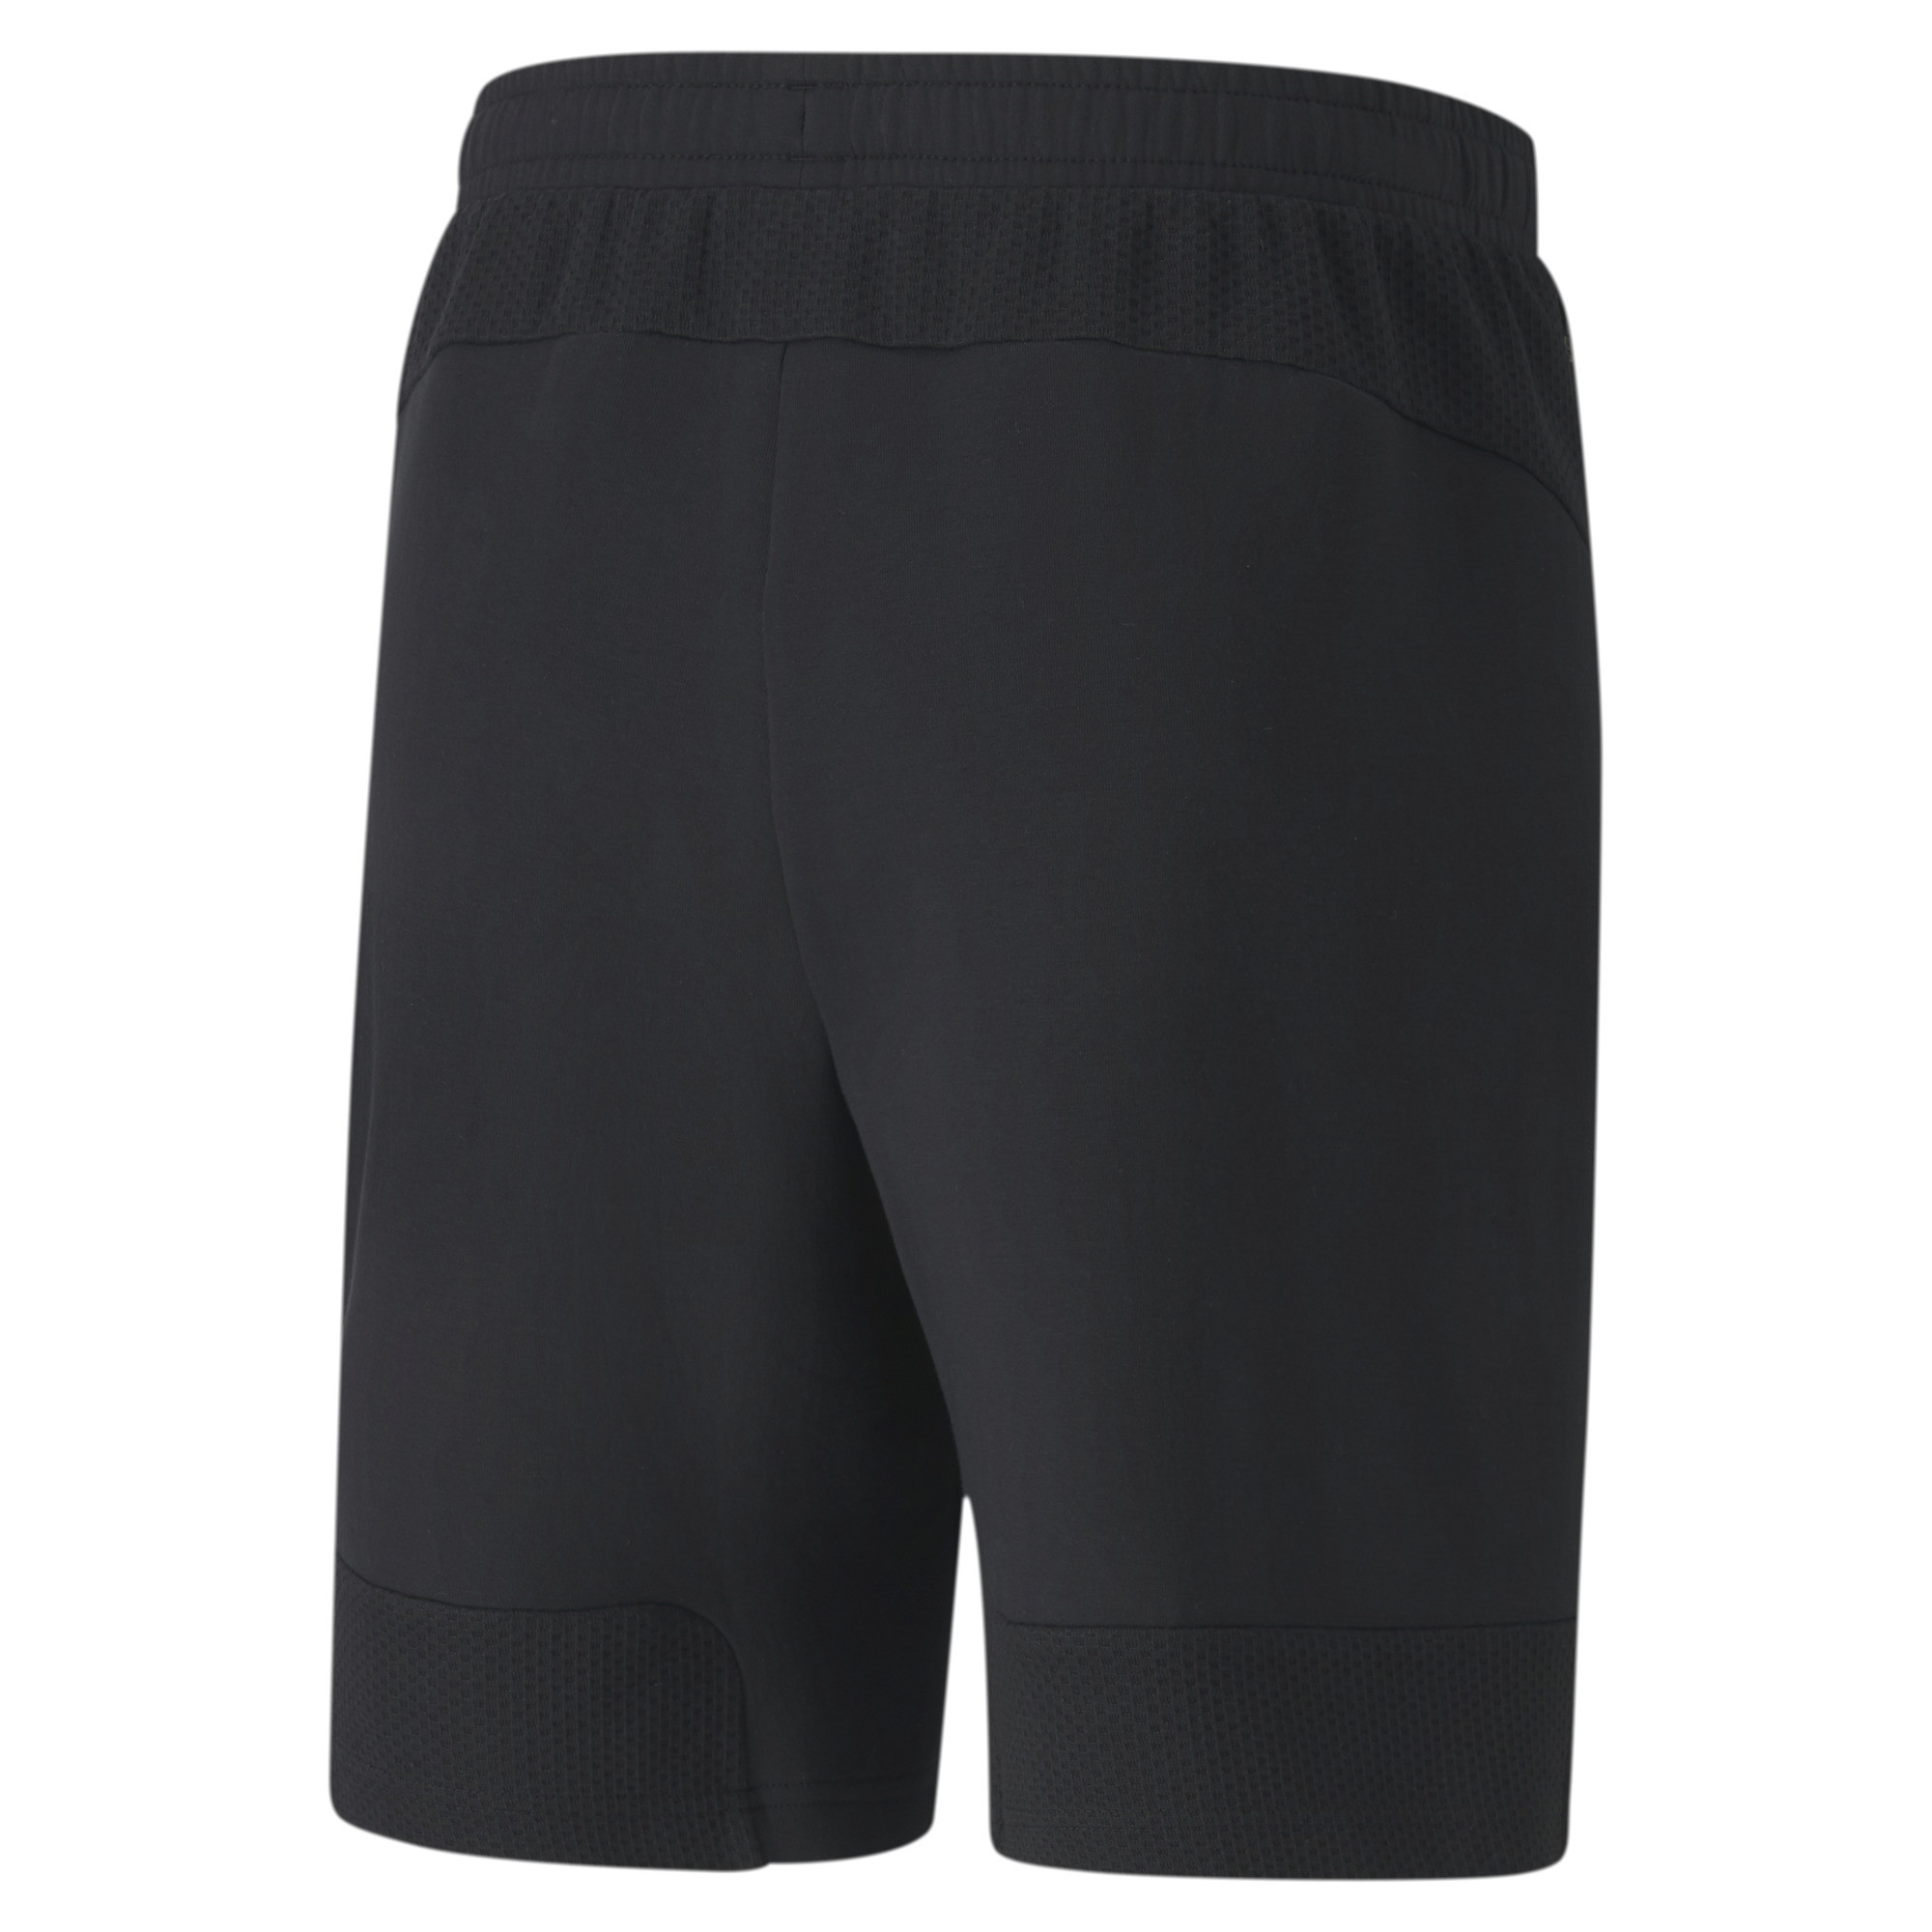 PUMA-Evostripe-Men-039-s-Shorts-Men-Knitted-Shorts-Basics thumbnail 3